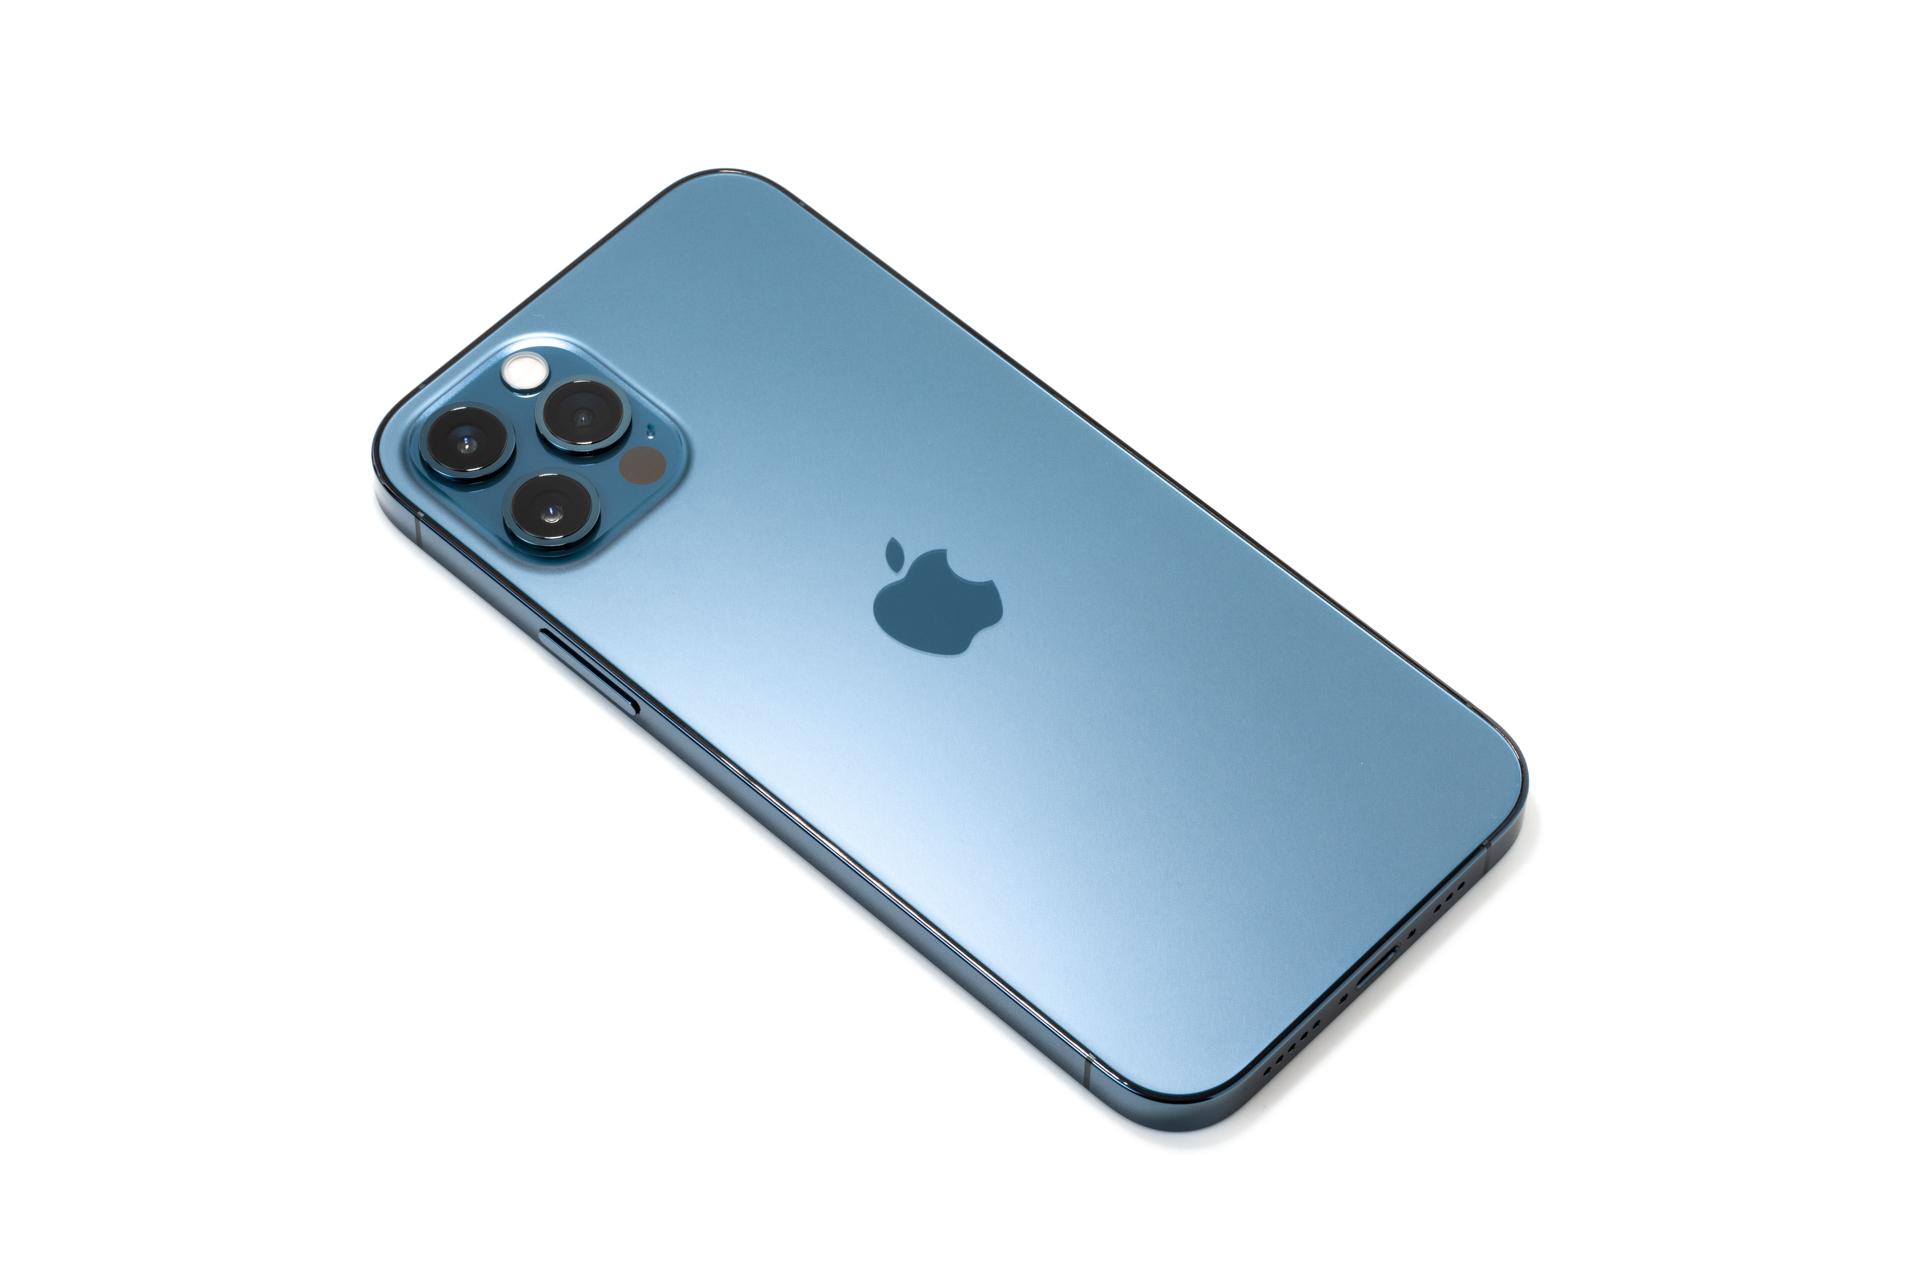 iPhone 12 Pro パシフィックブルー の背面